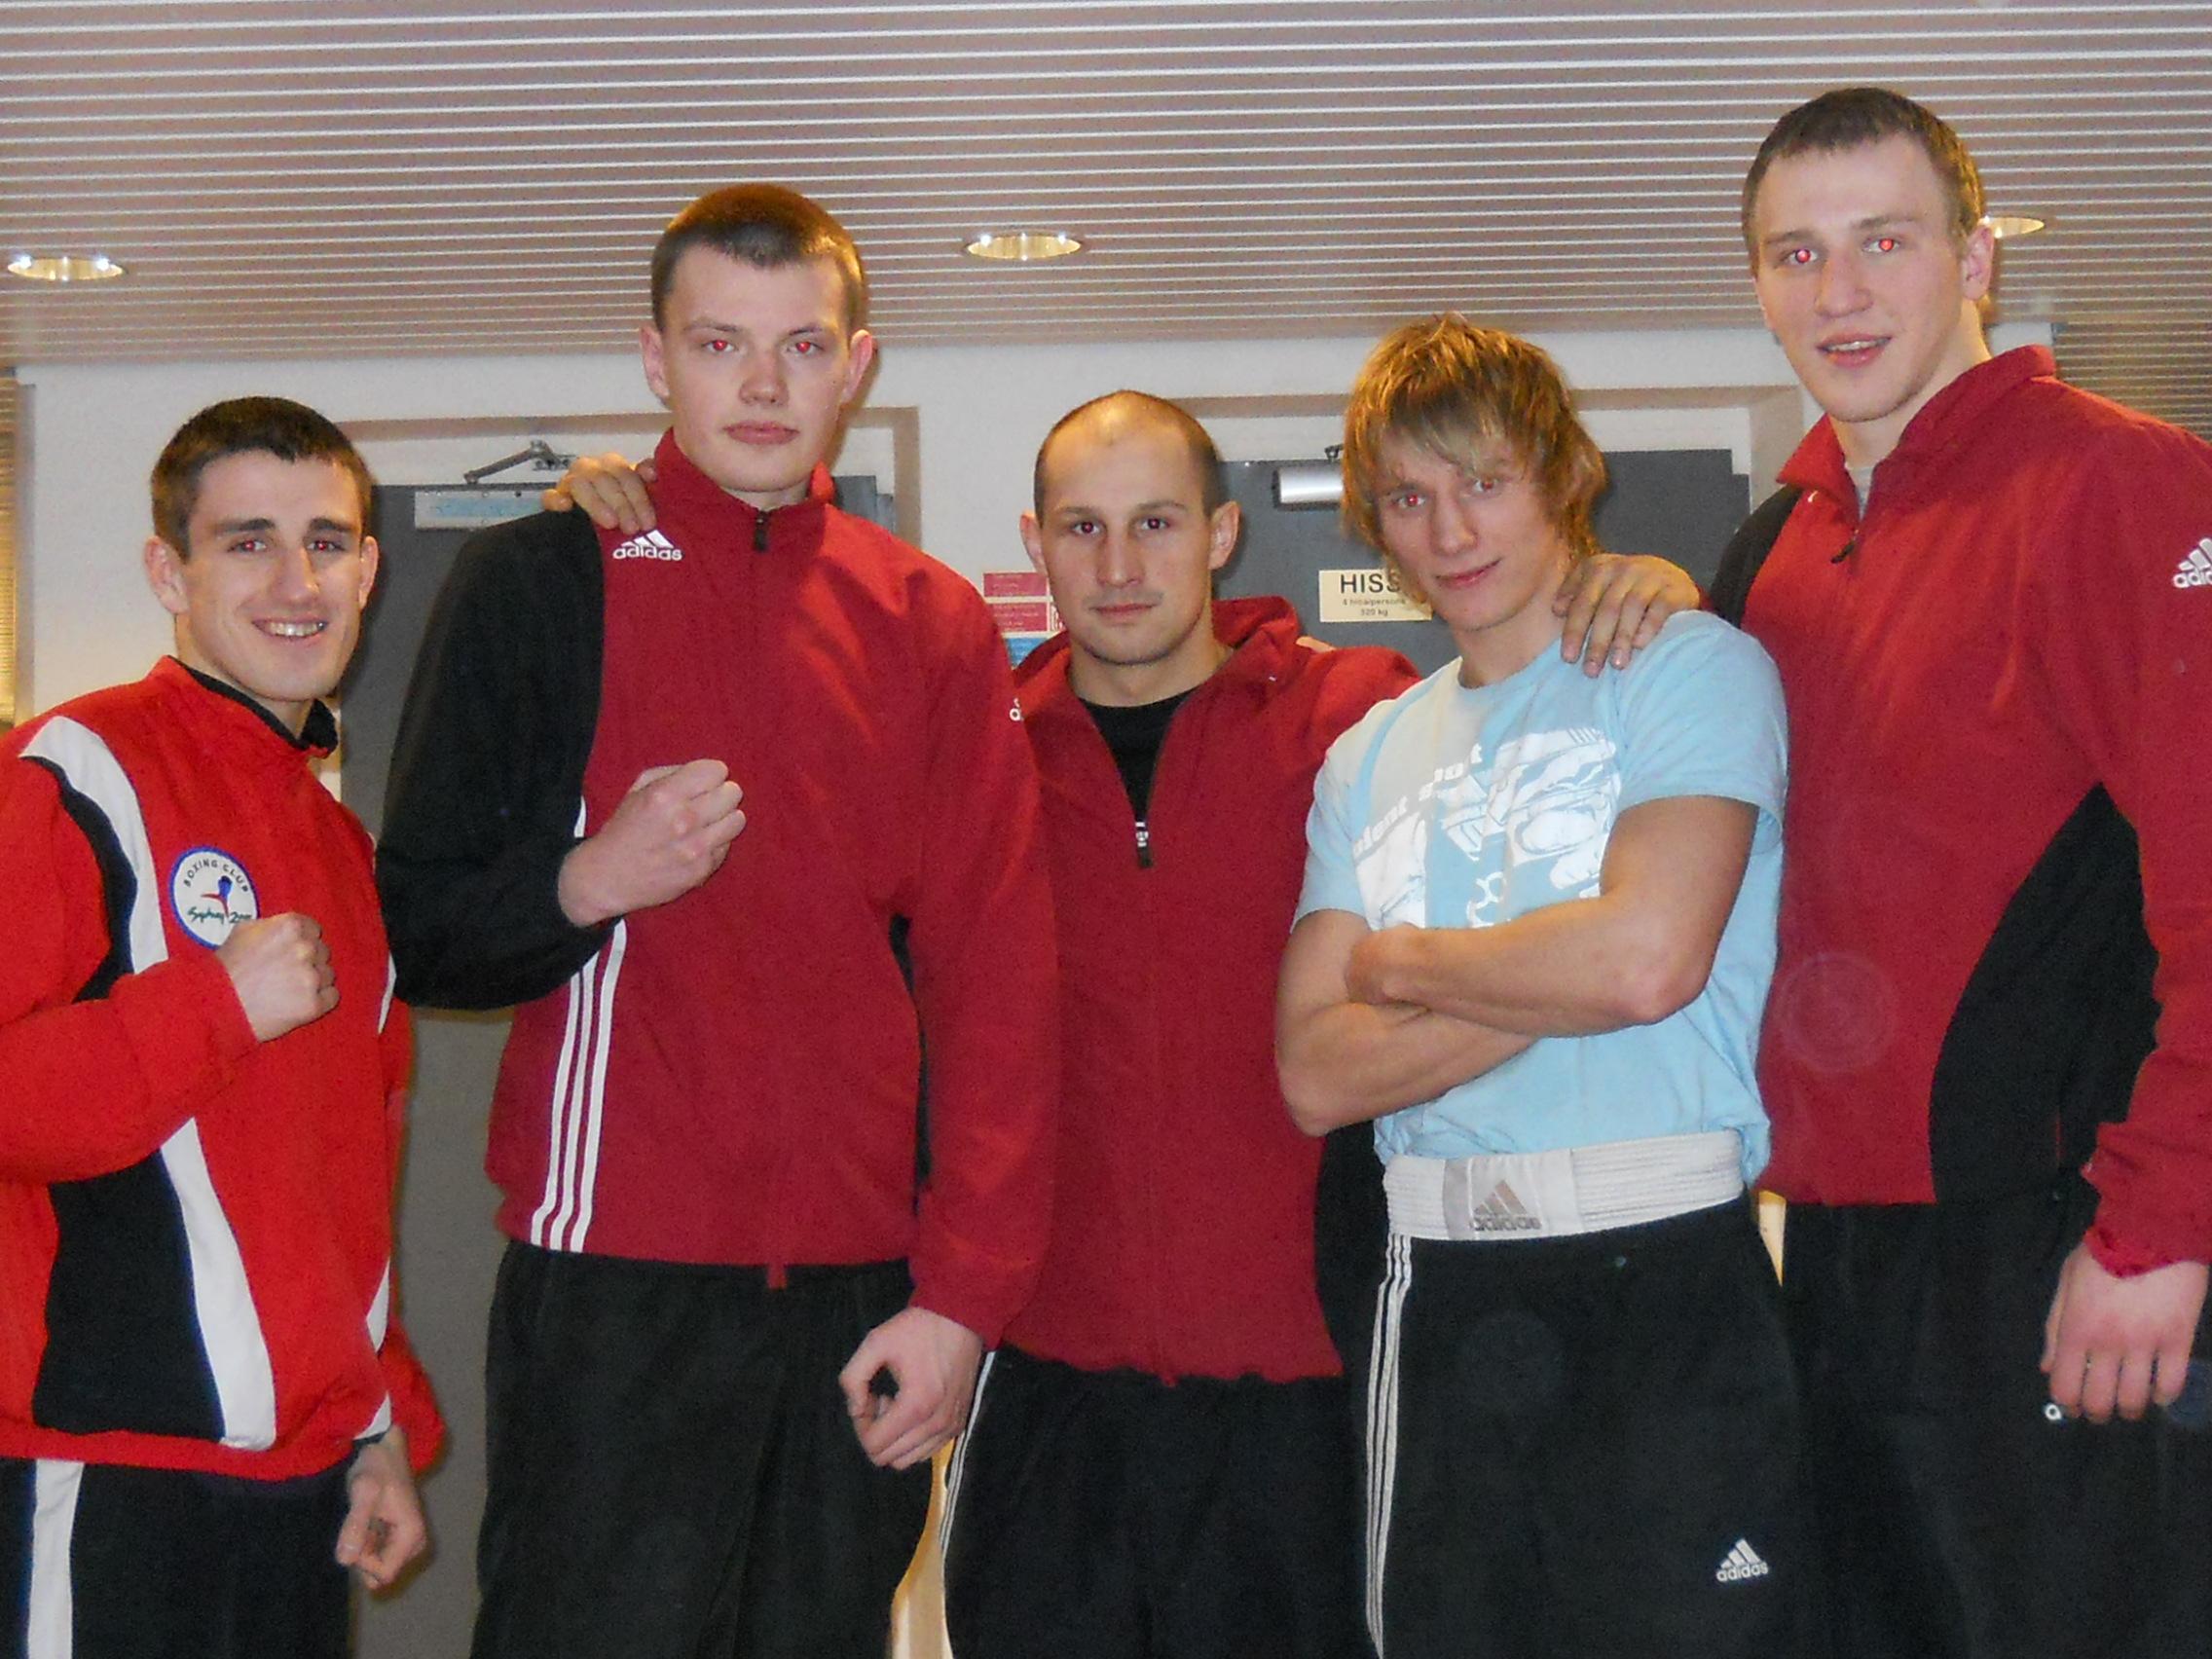 latvia boxing team